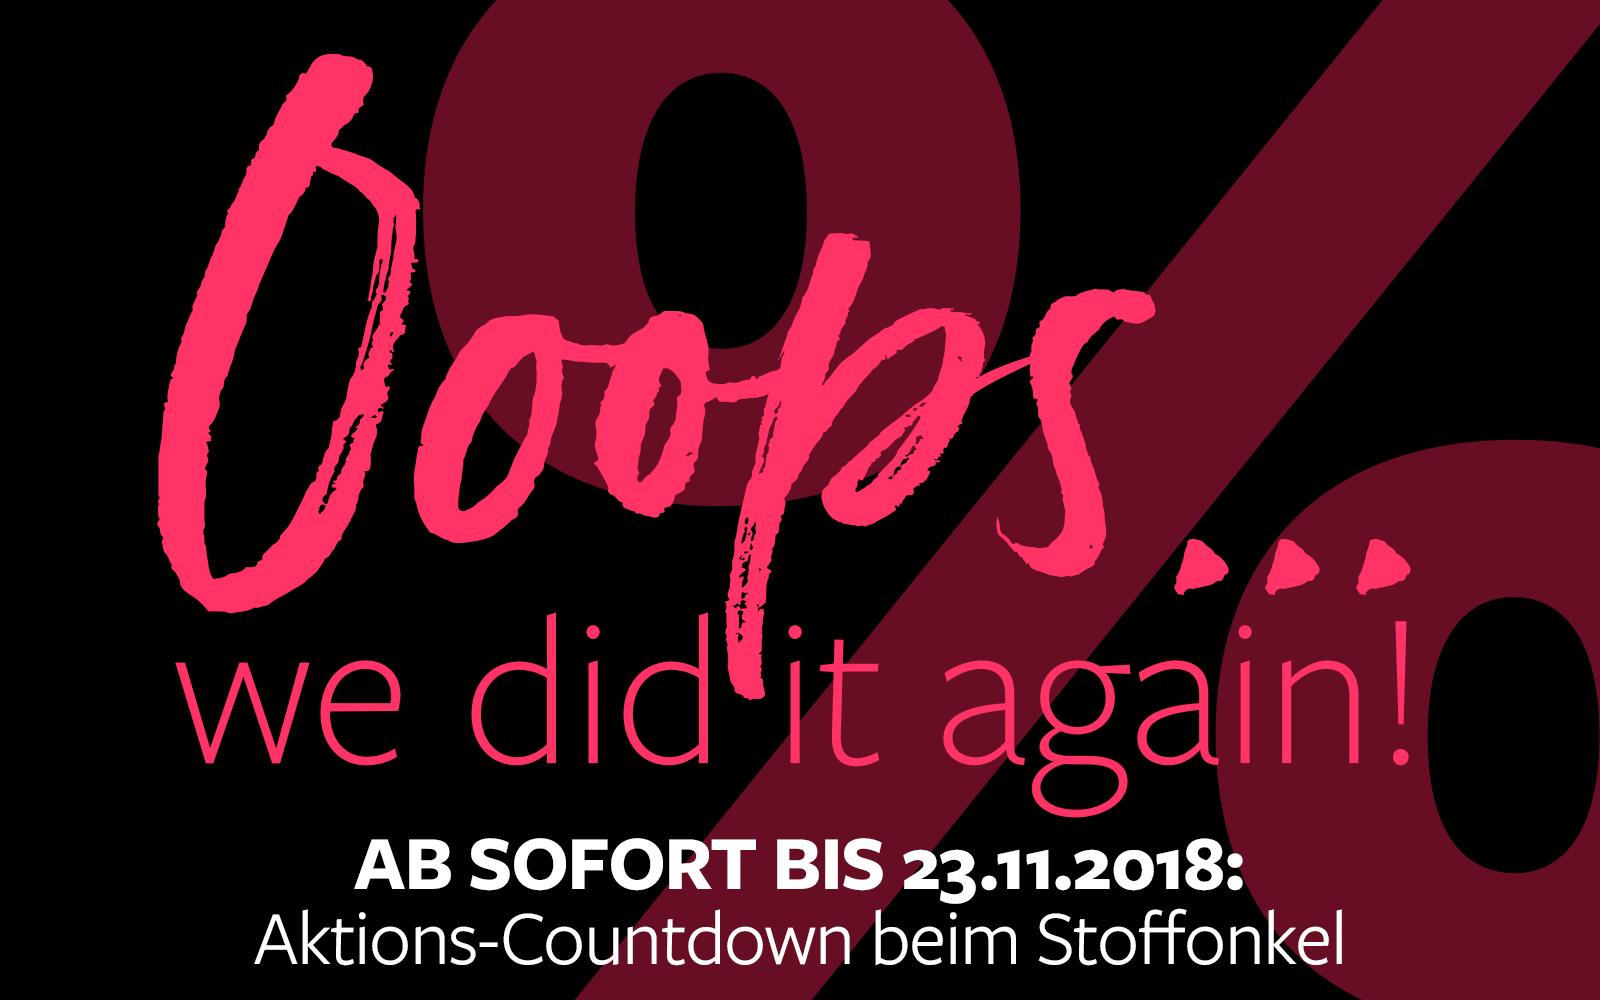 OopsDays - Aktions-Countdown beim Stoffonkel!